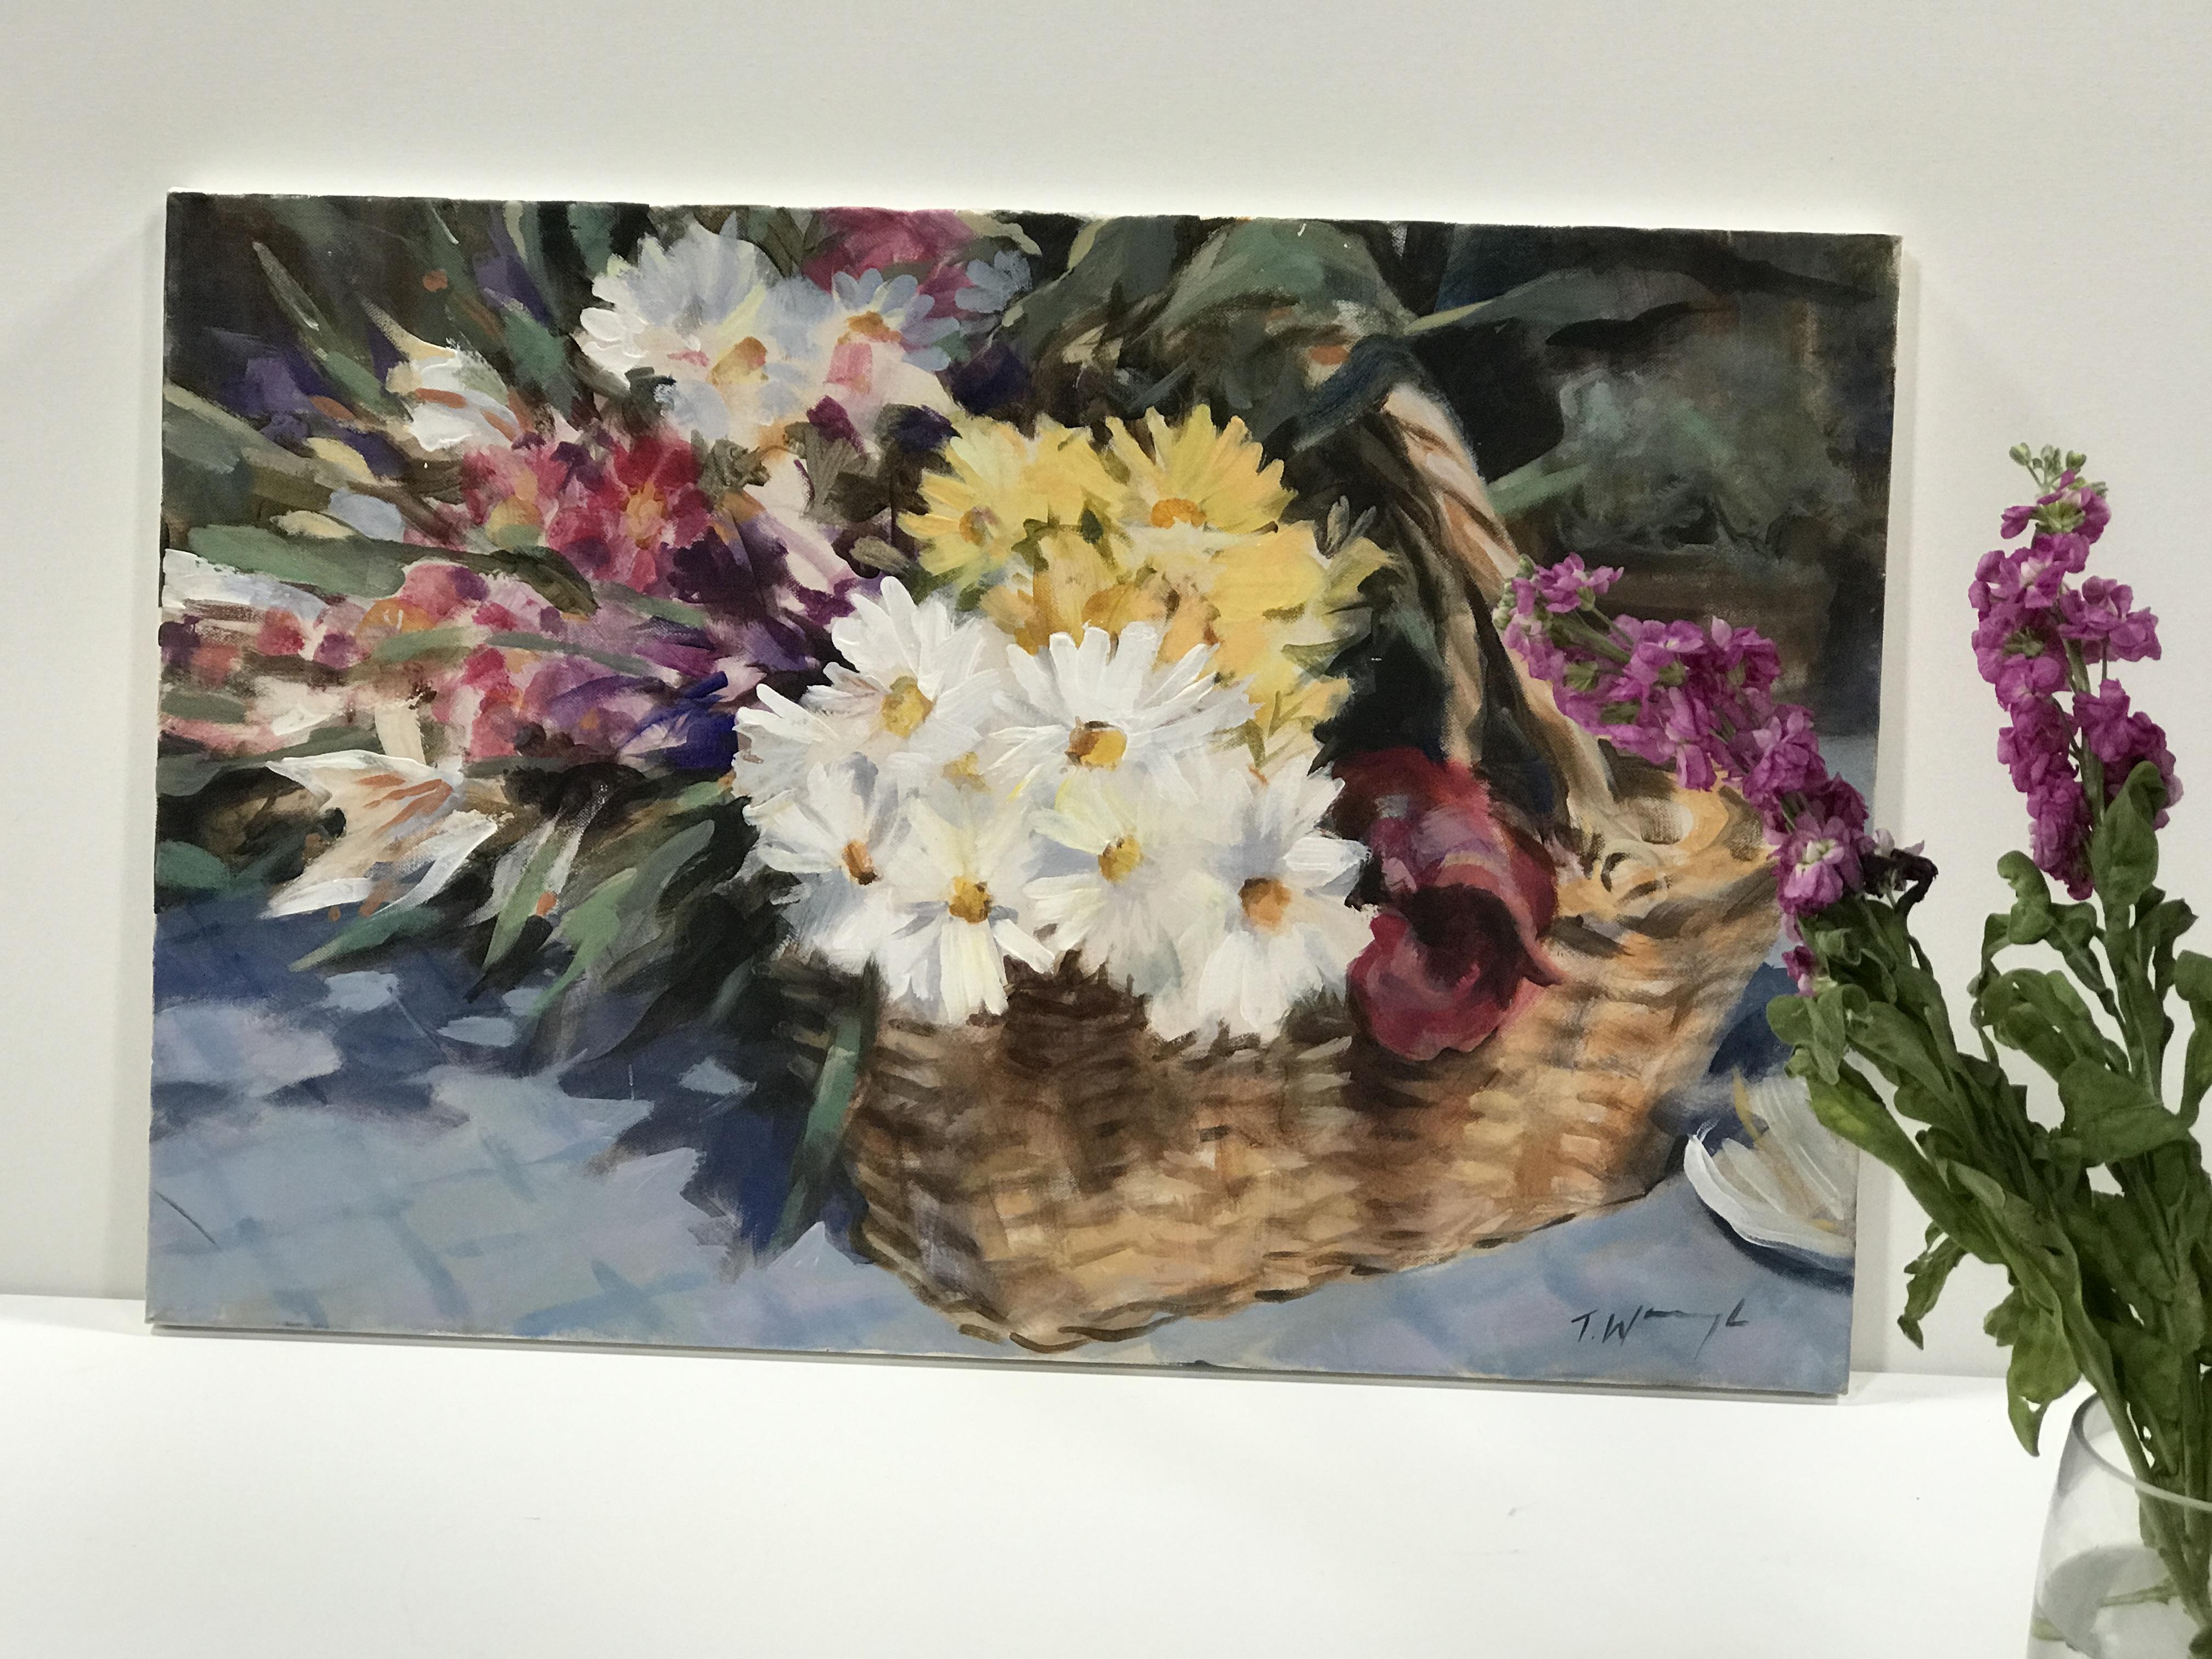 Trevor Waugh, Flower Basket, is an original oil painting depicting a still life scene.